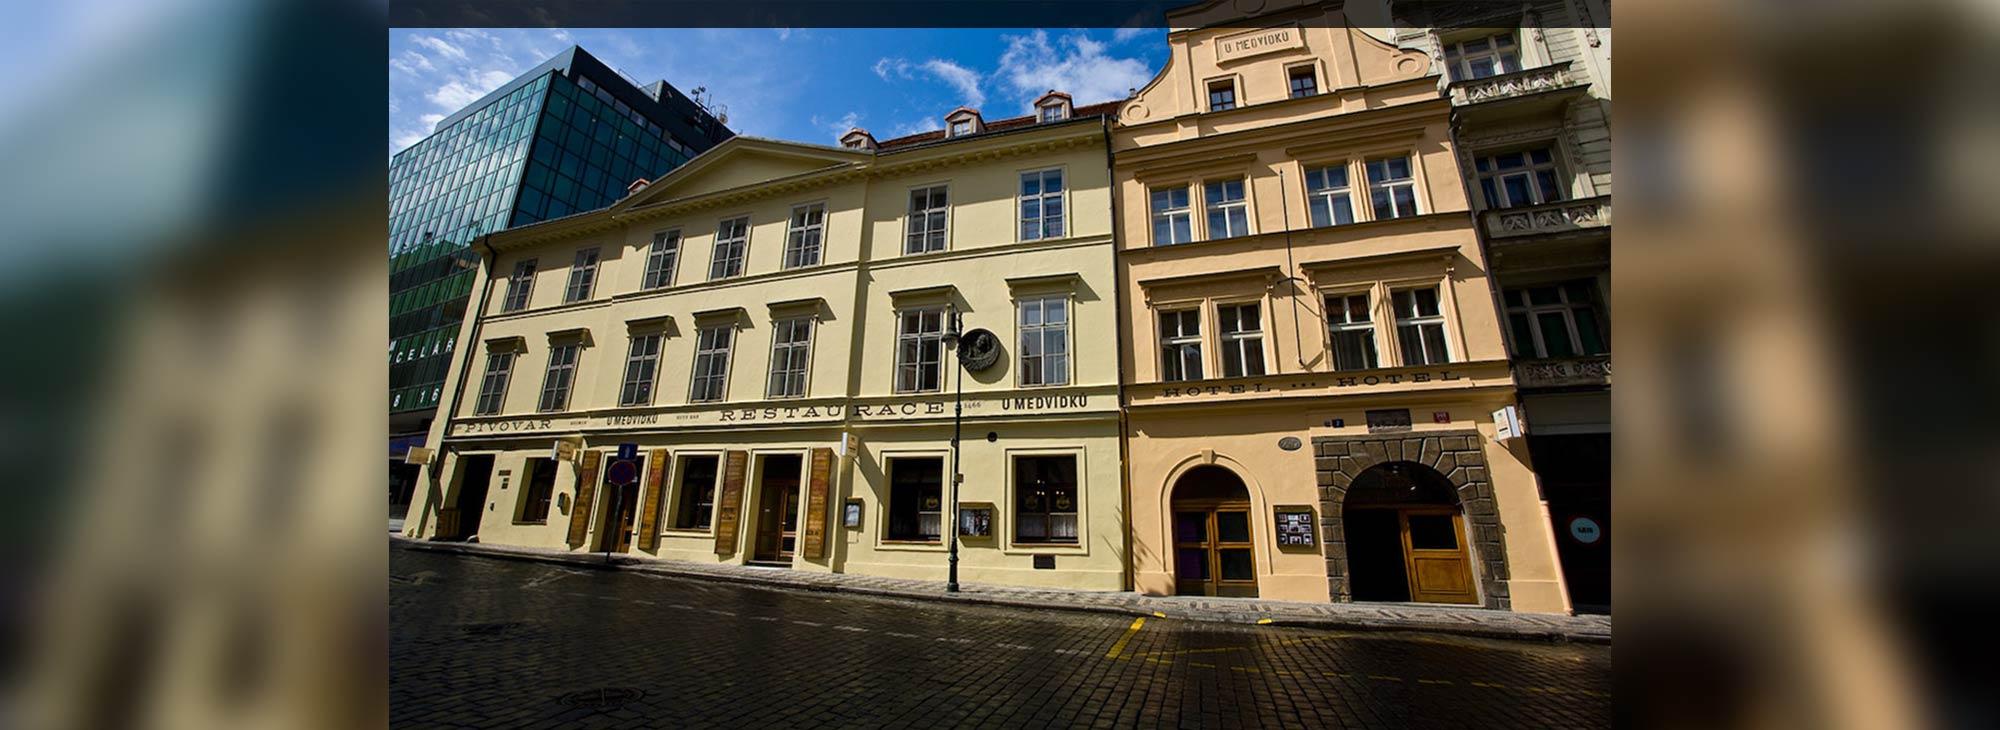 Restaurant, hotel, brewery U Medvidku - Prag, Czech Republic